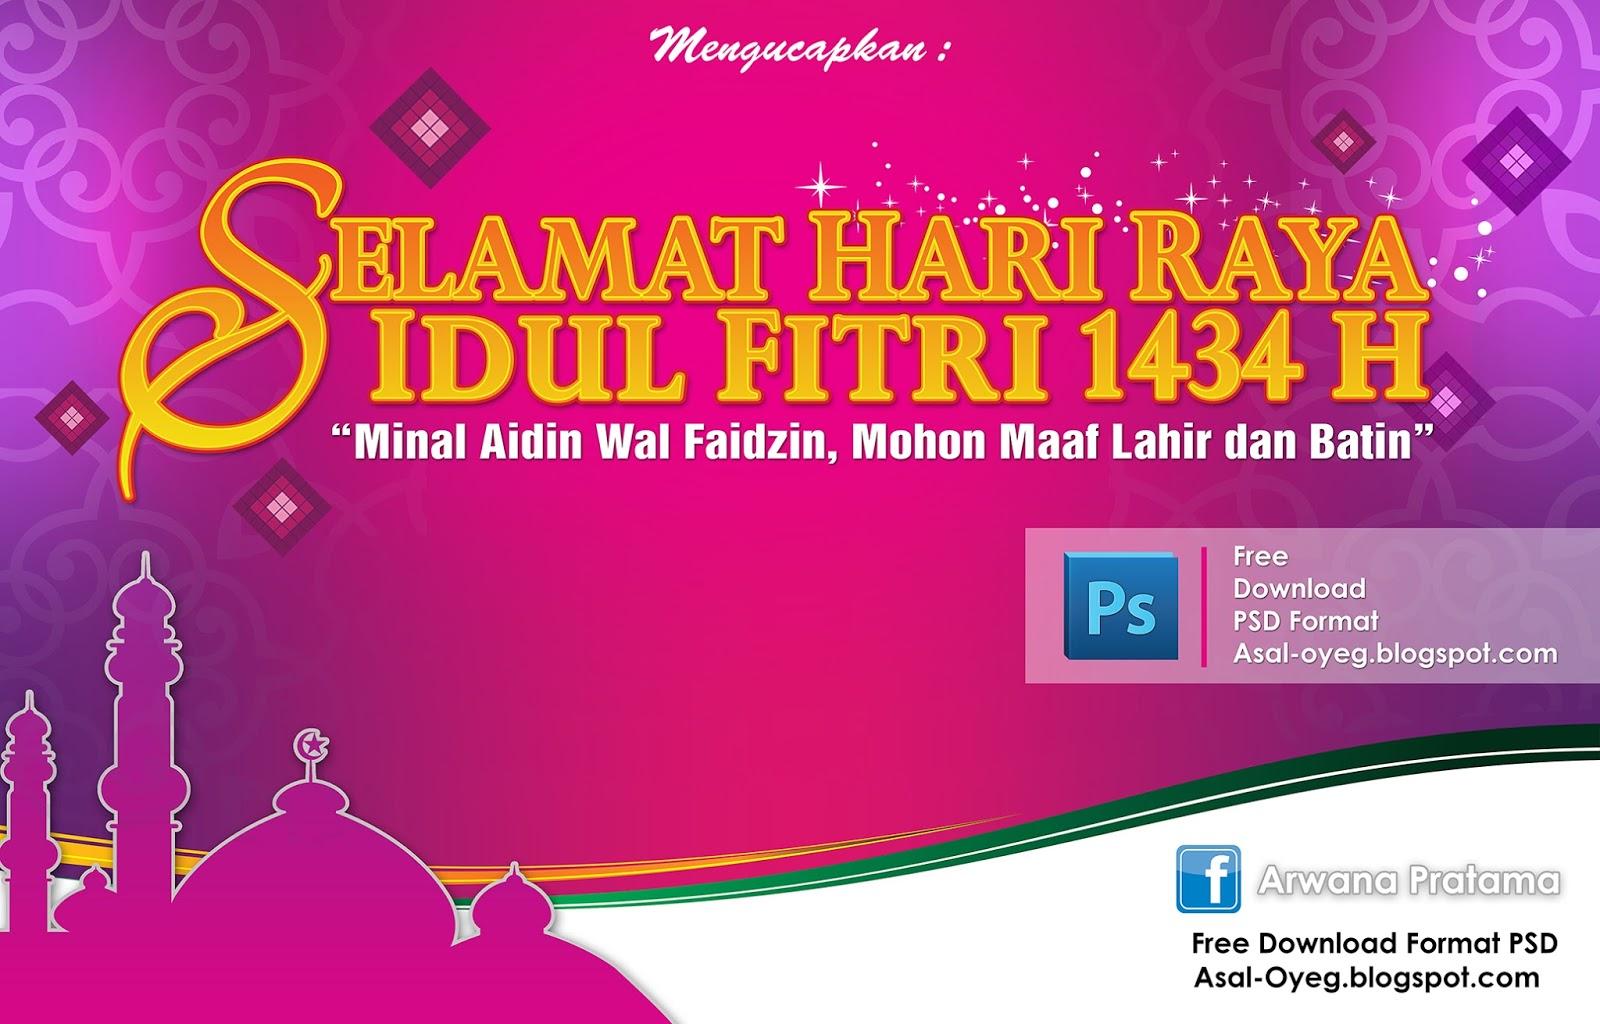 Selamat Idul Fitri Psd | Joy Studio Design Gallery - Best ...